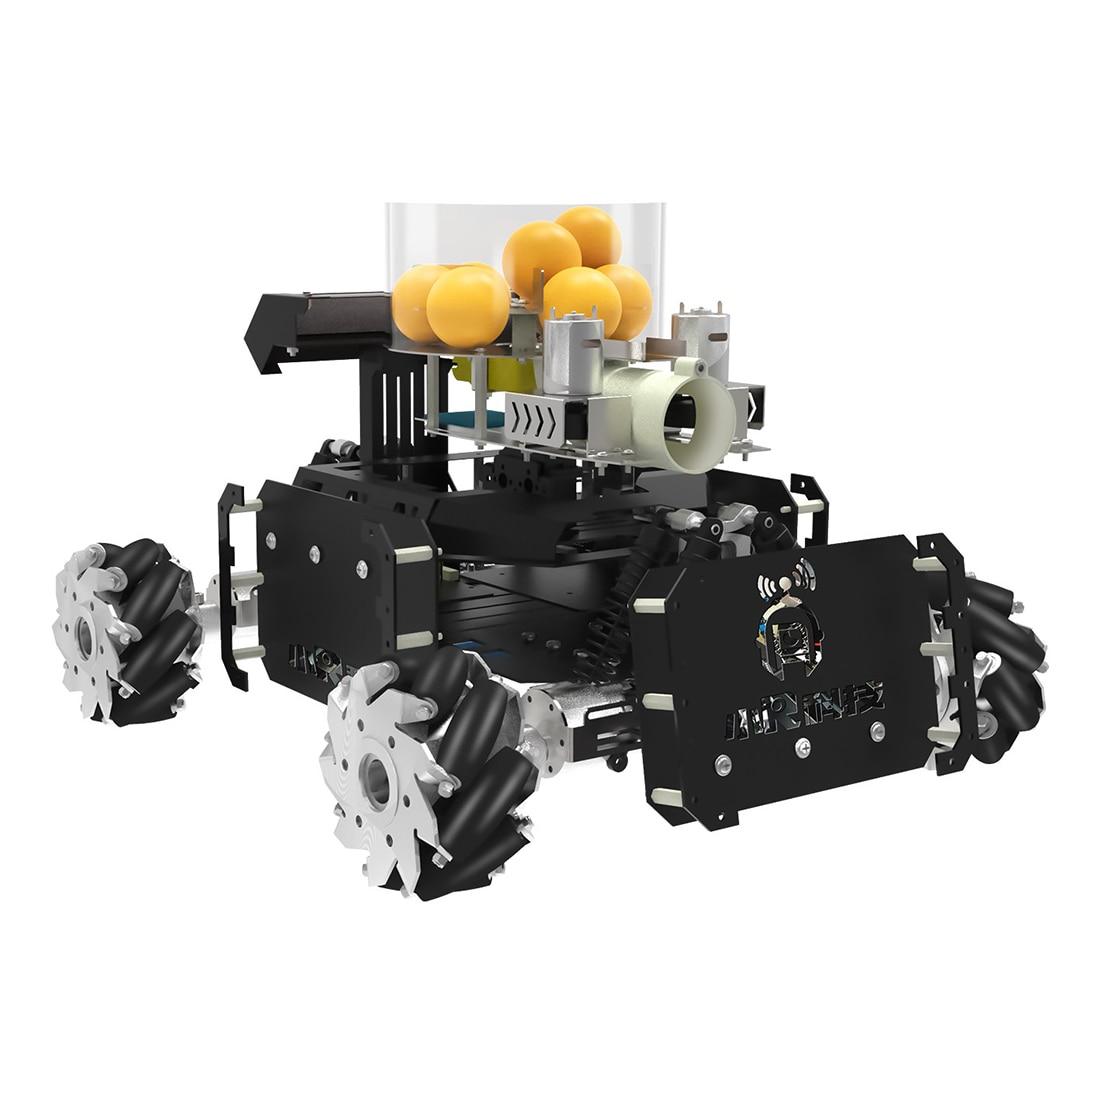 DIY Steam Omni Wheel Turret Chariot VR Video Wifi Control XR Master Intelligent Programmable Battle Robot For STM32 - Black